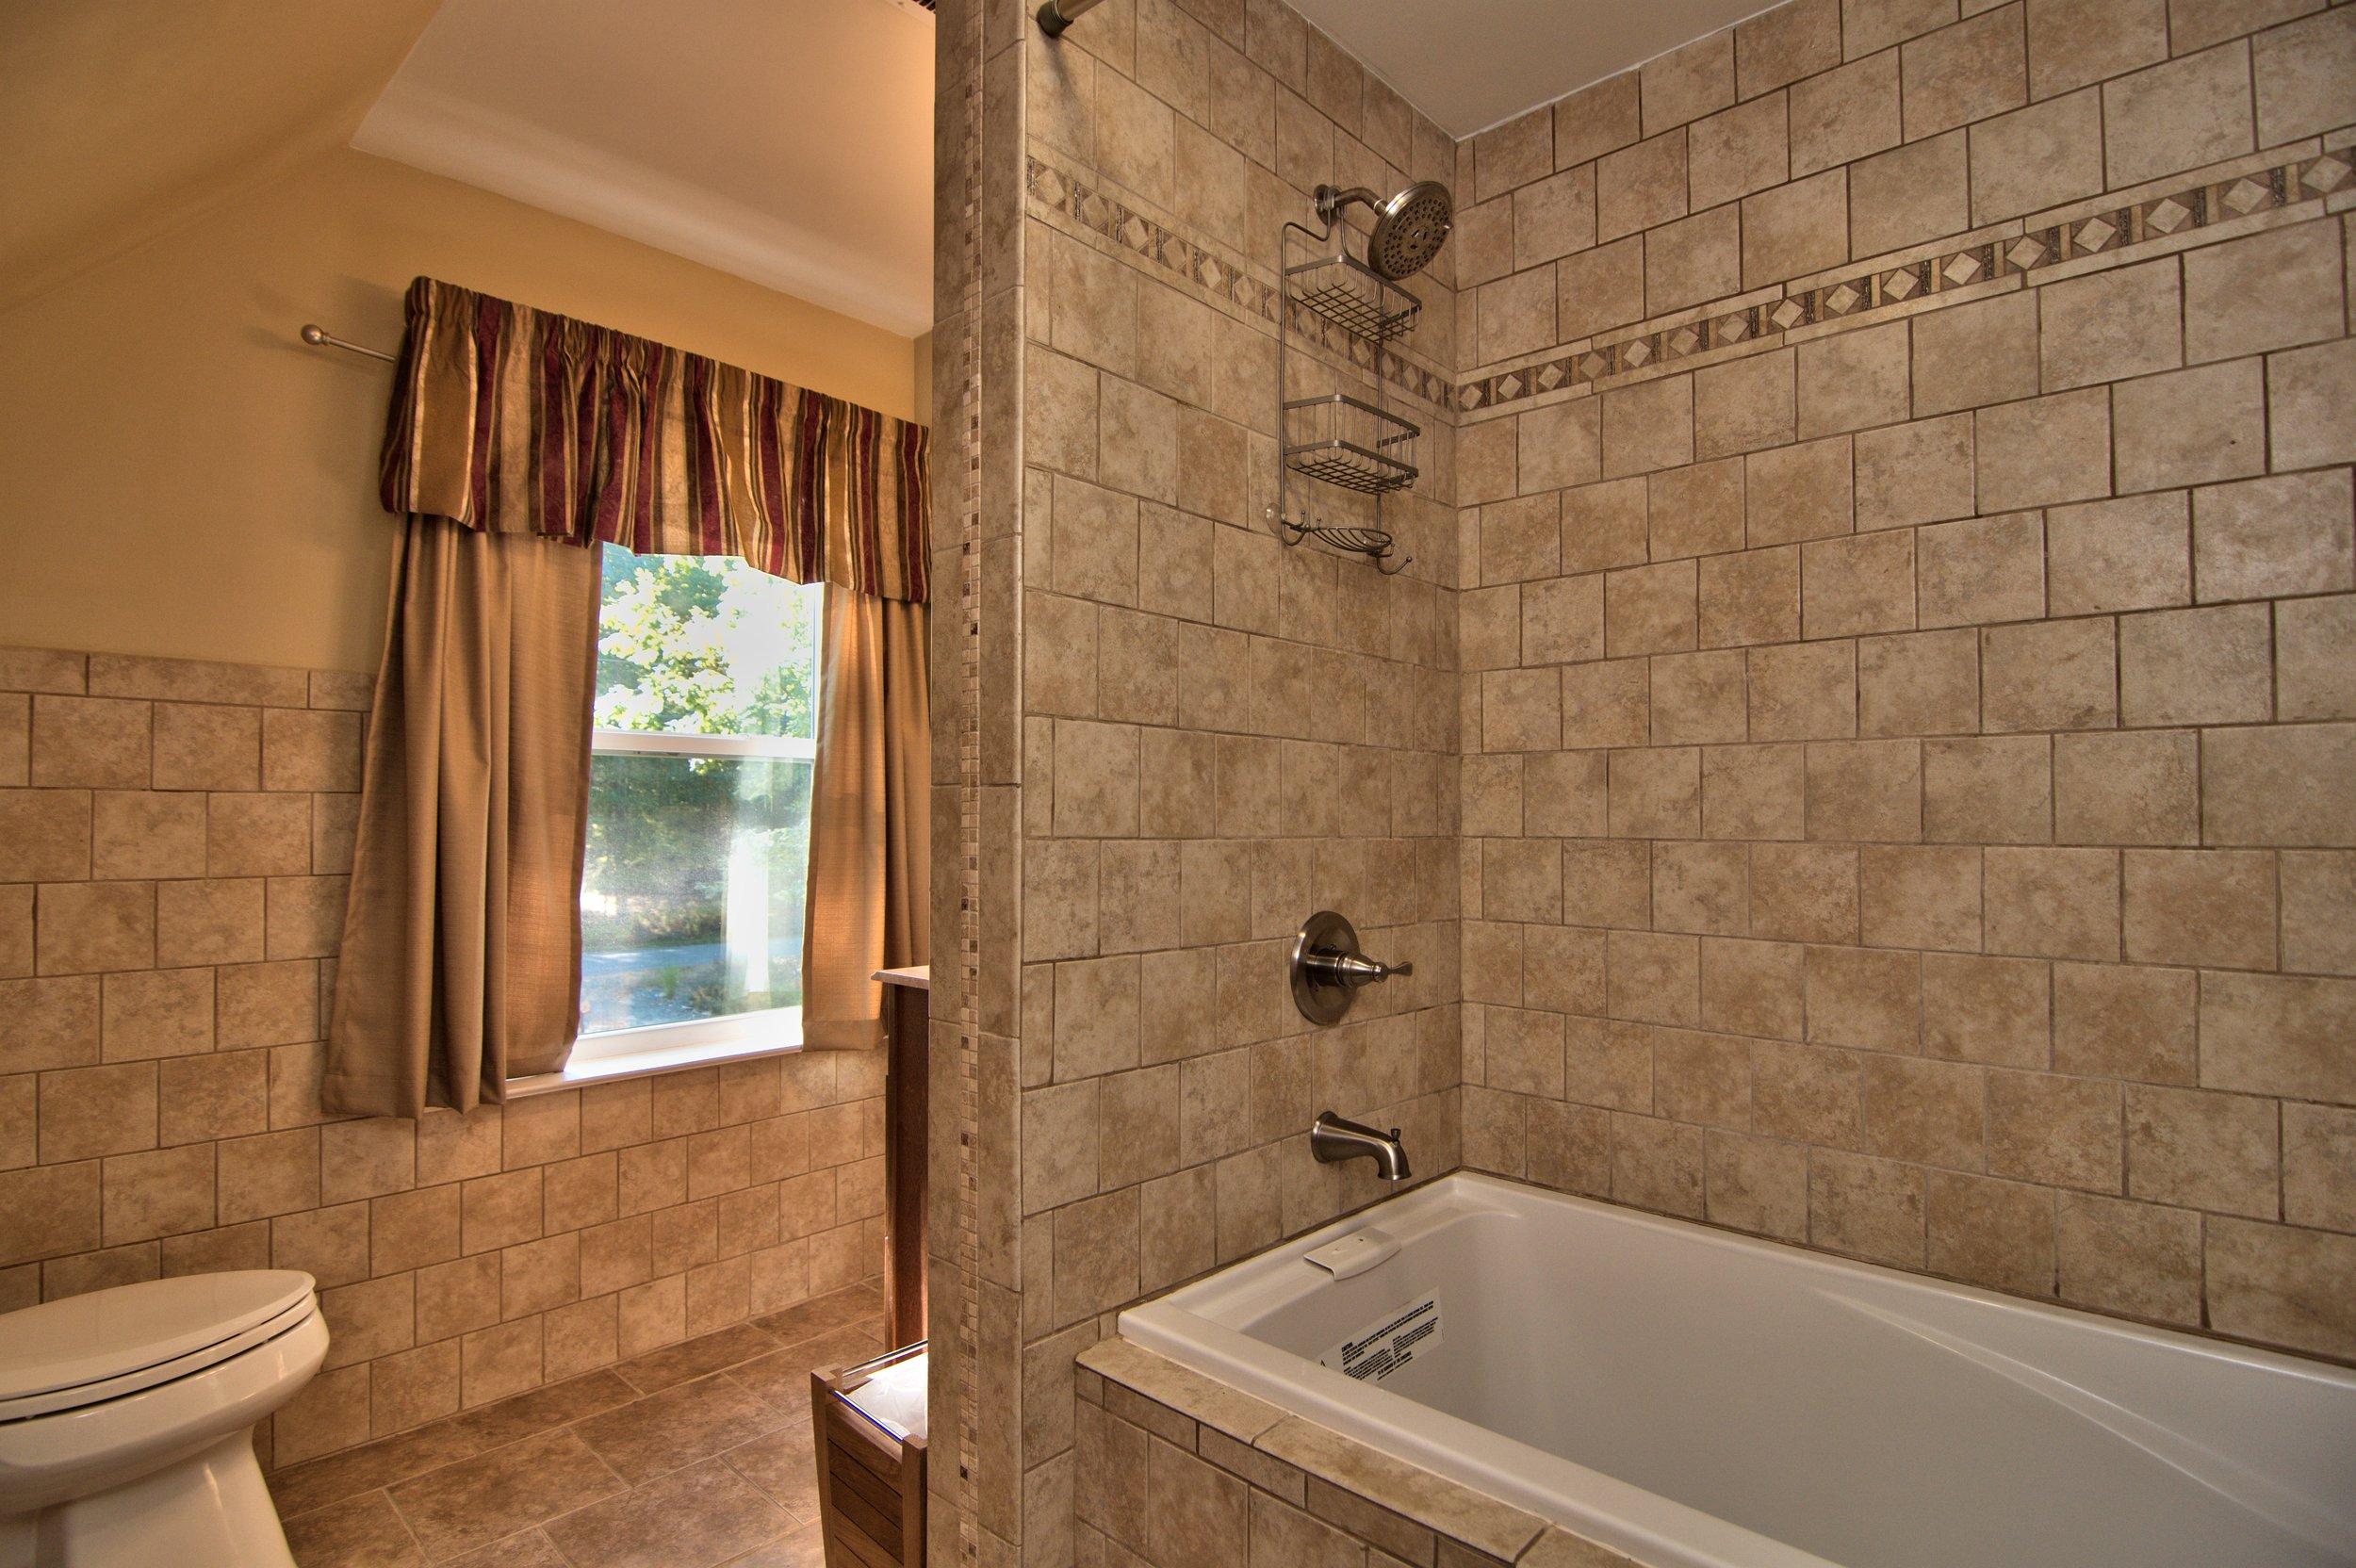 2nd Floor Bath View 2.jpg